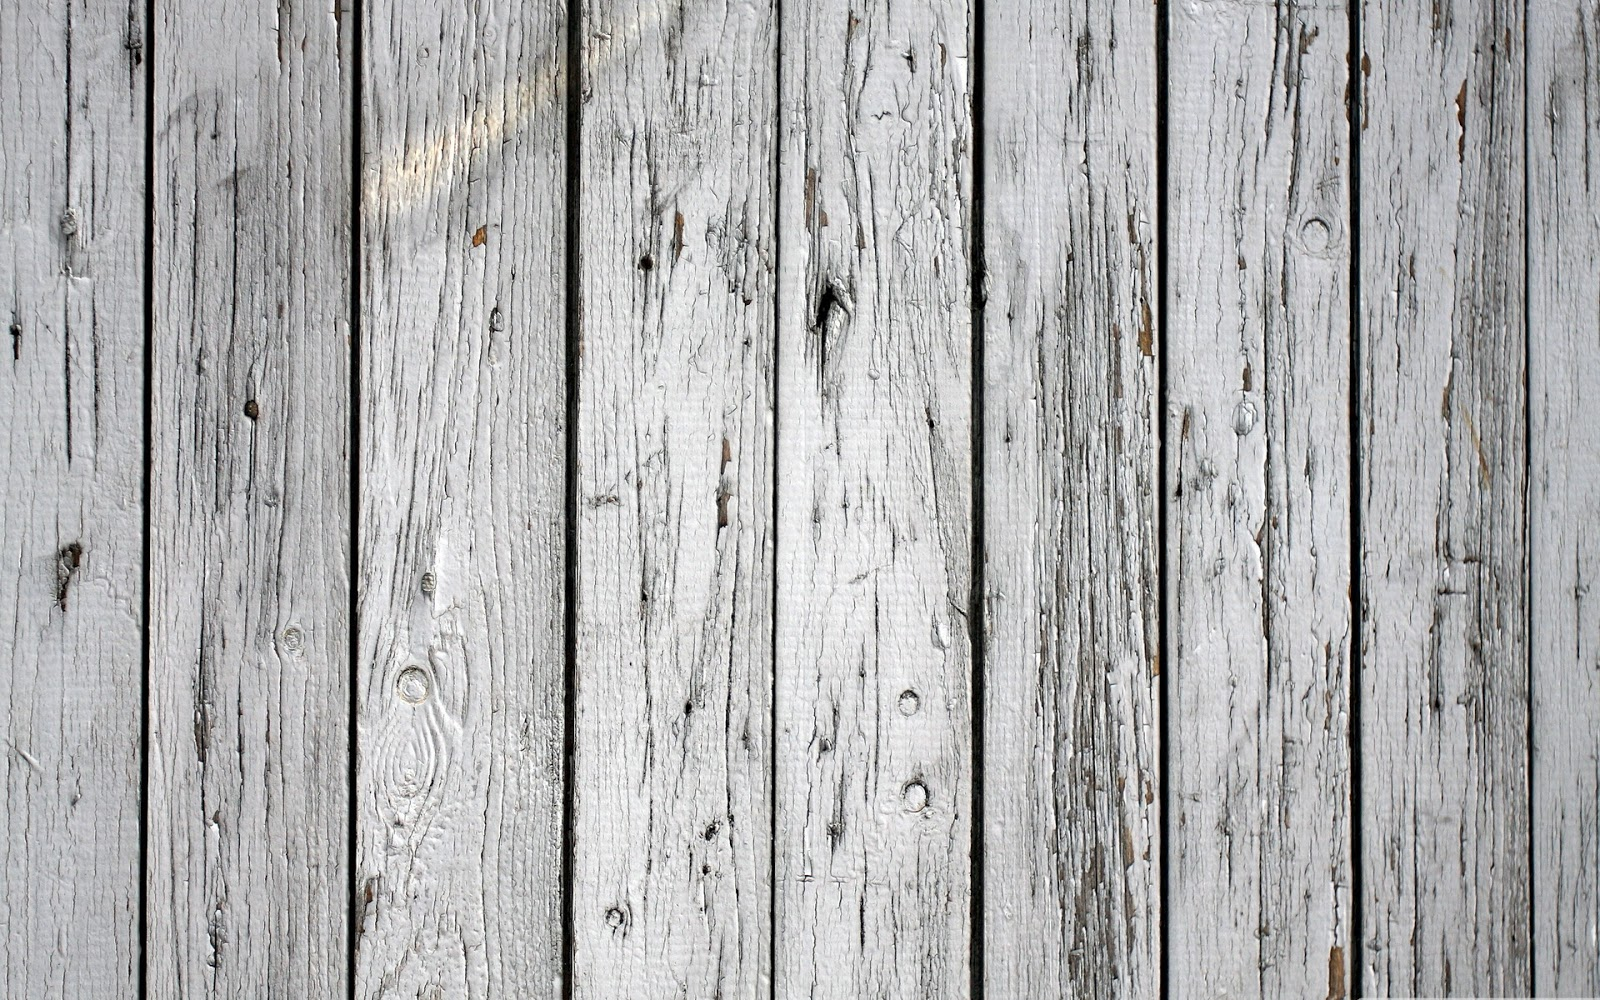 Fond d'écran bois hd - Fond d'écran hd